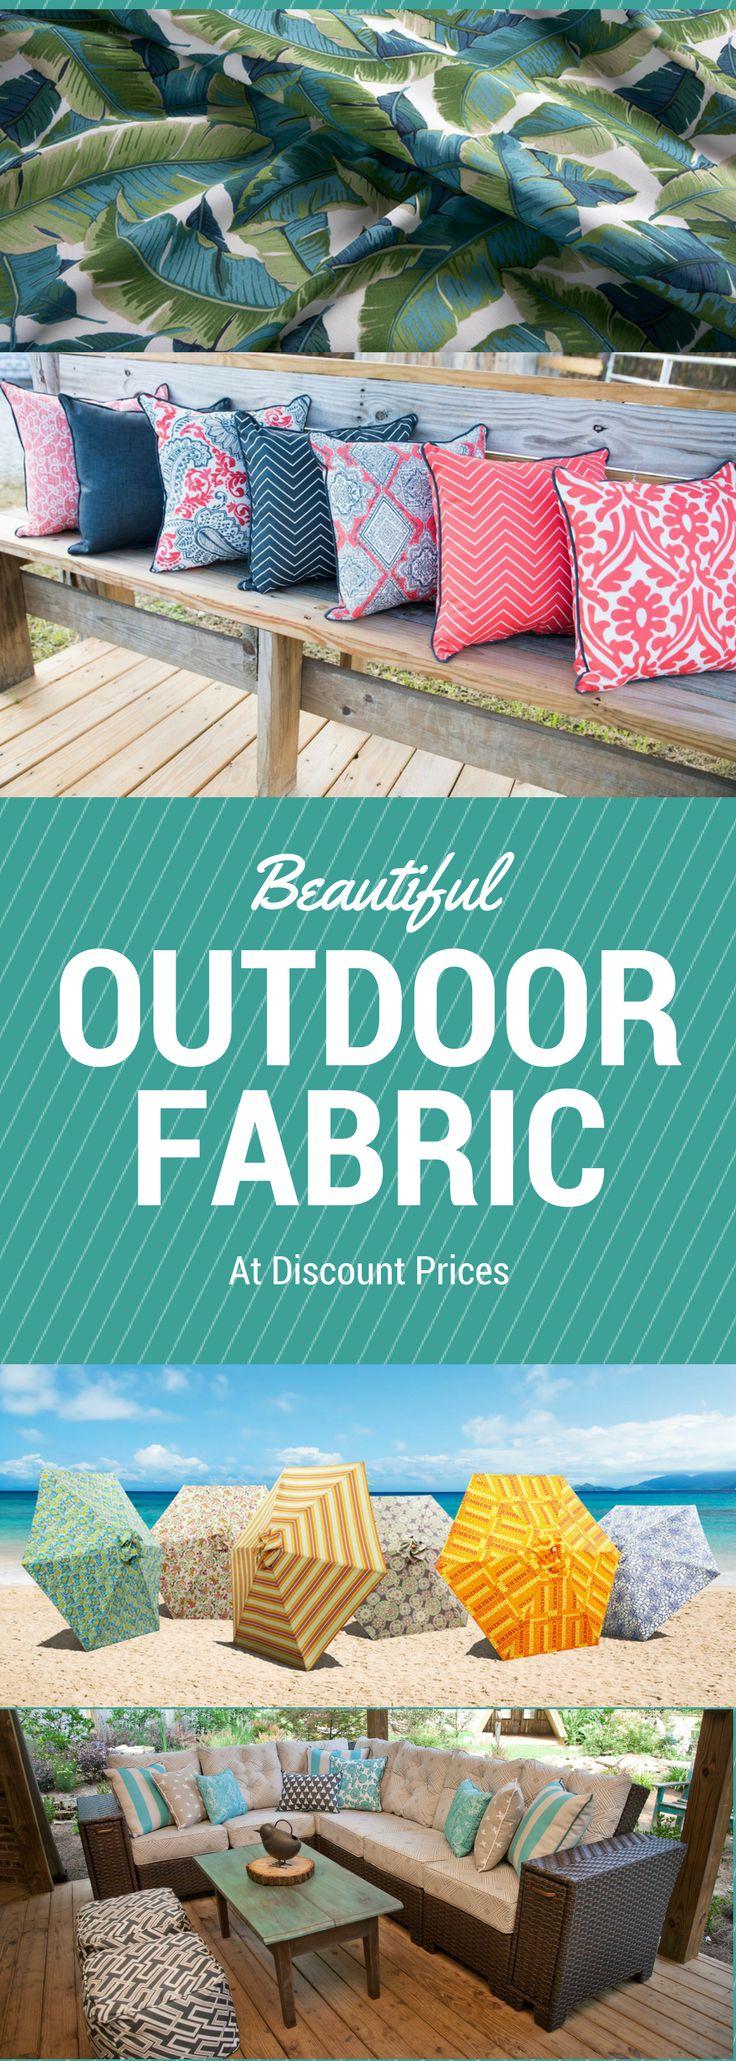 Discount outdoor fabric by the yard - Fabricguru Com Carries Over 6 000 Discount Outdoor Fabrics From All Your Favorite Designers Sunbrella